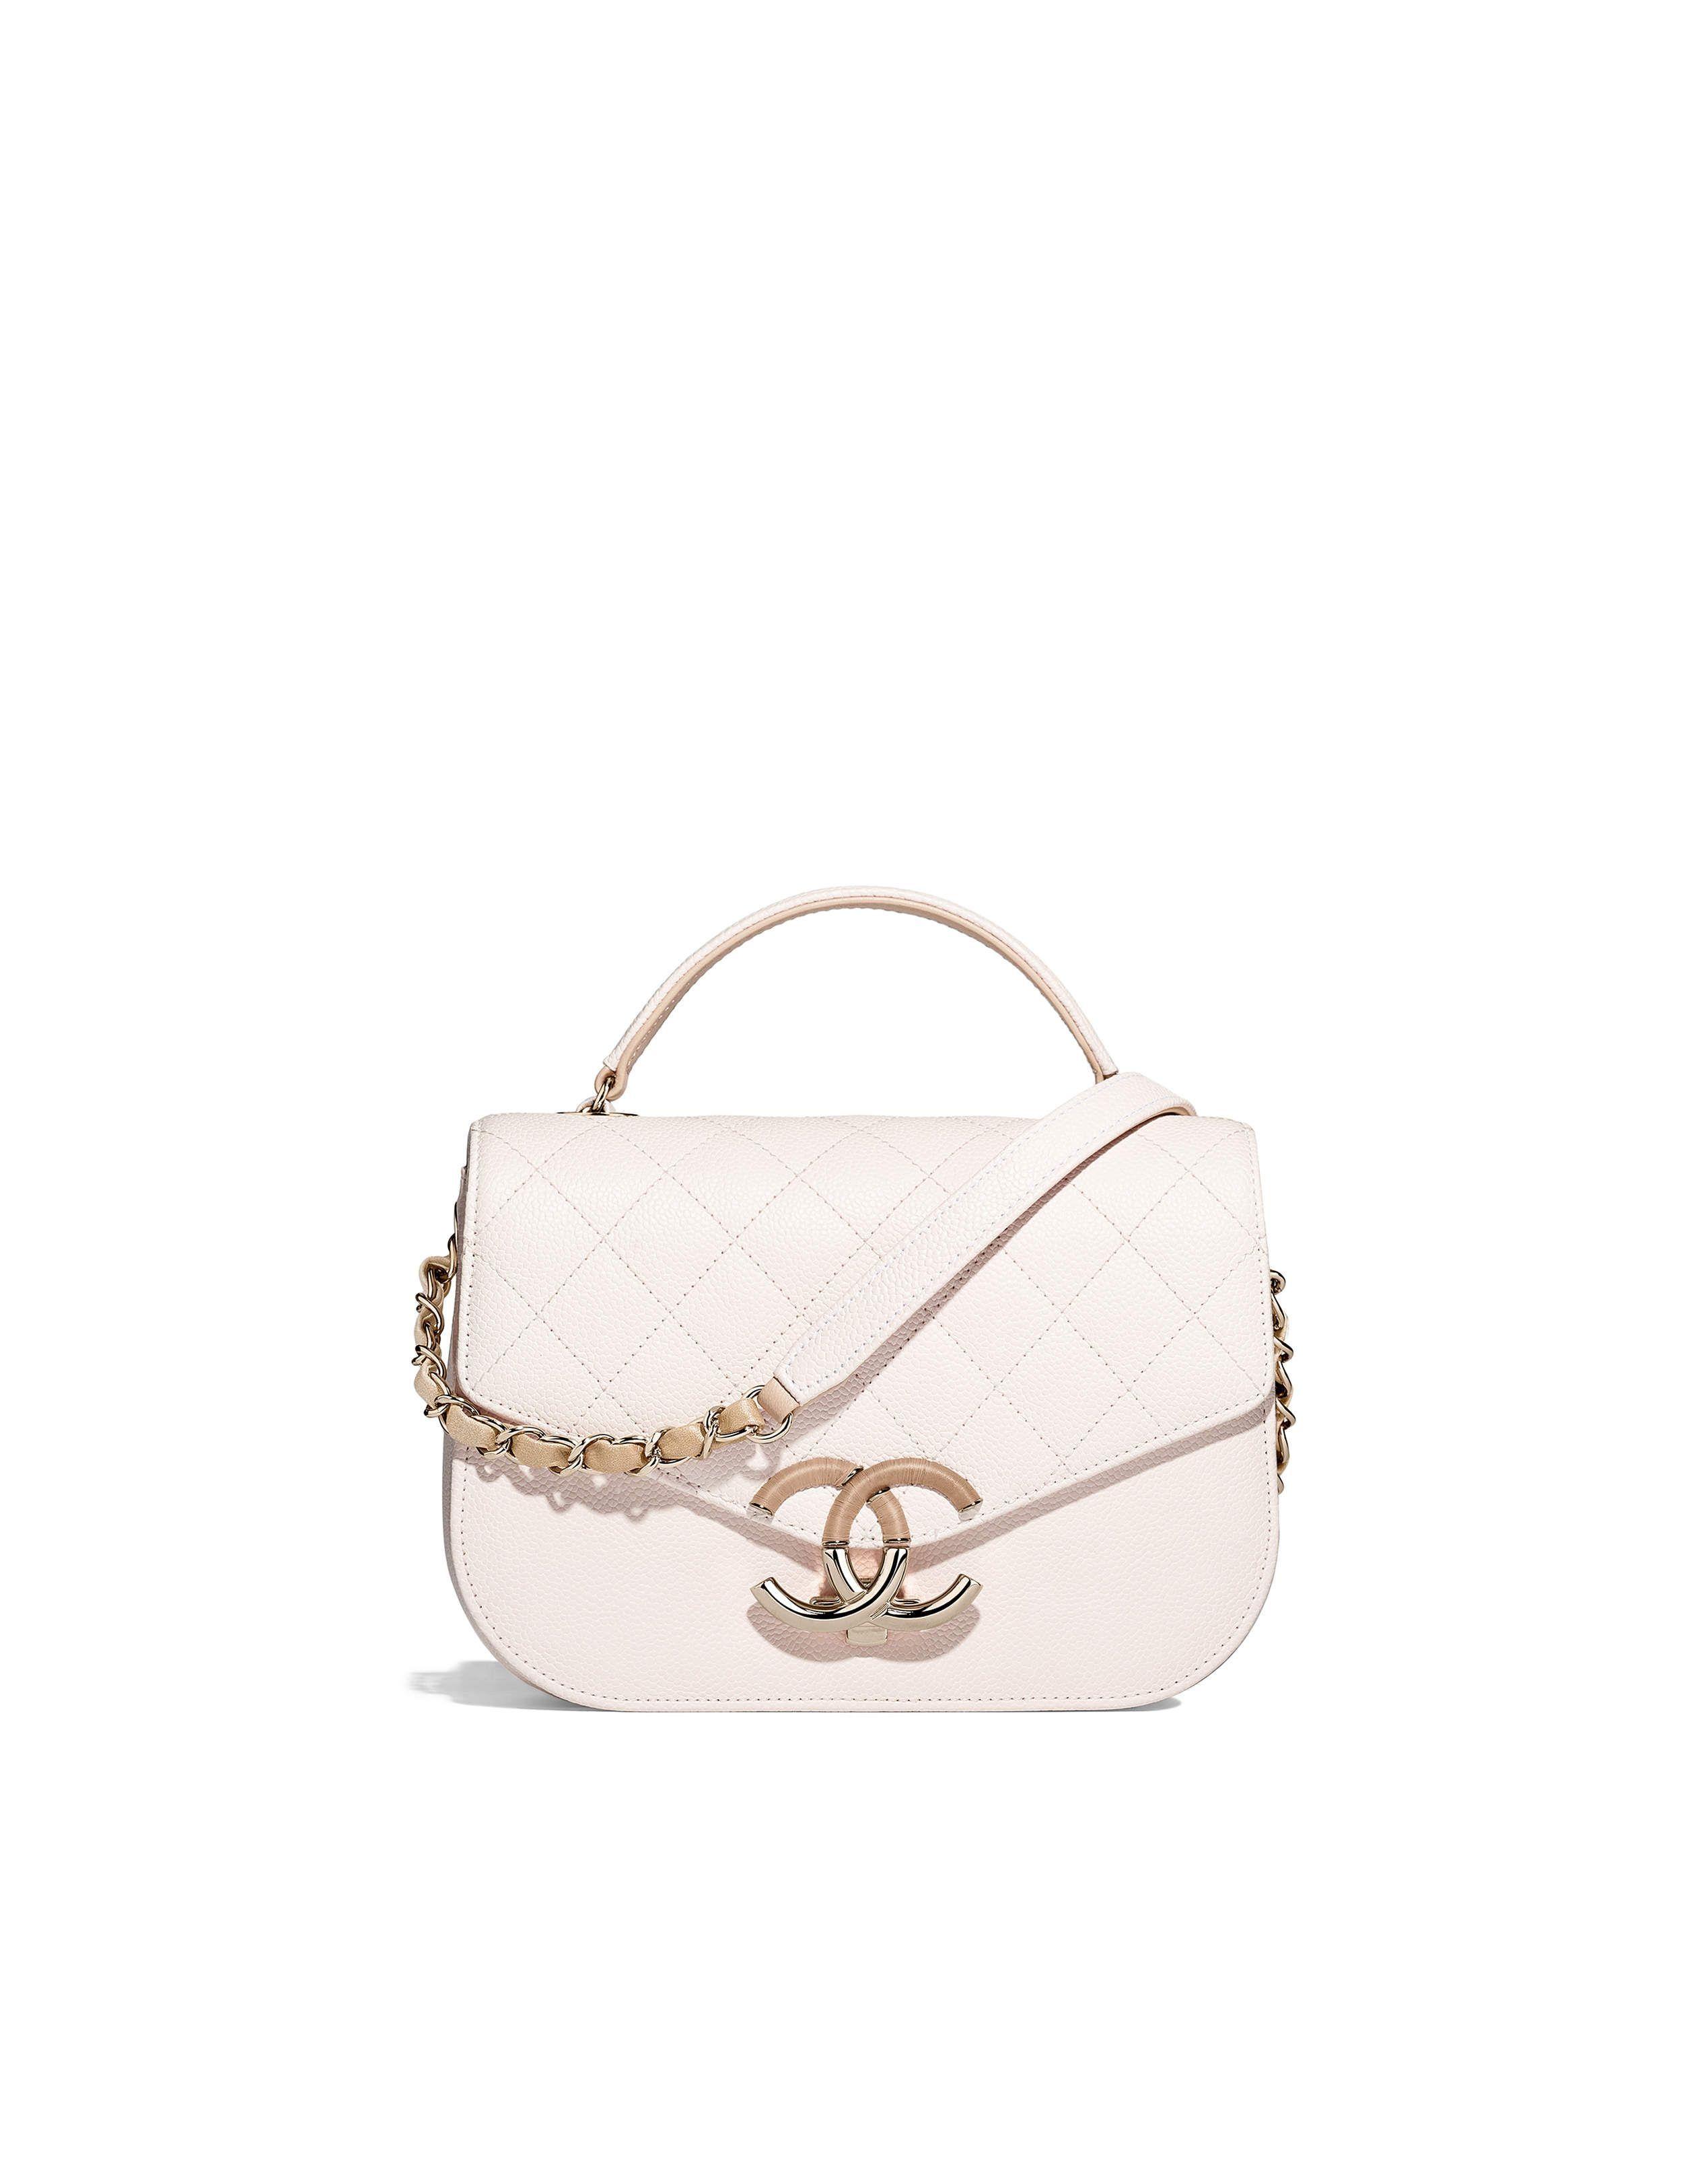 3caaf58fd8389e Cruise 2017/18 - lambskin & gold-tone metal-black   Chanel handbags ...